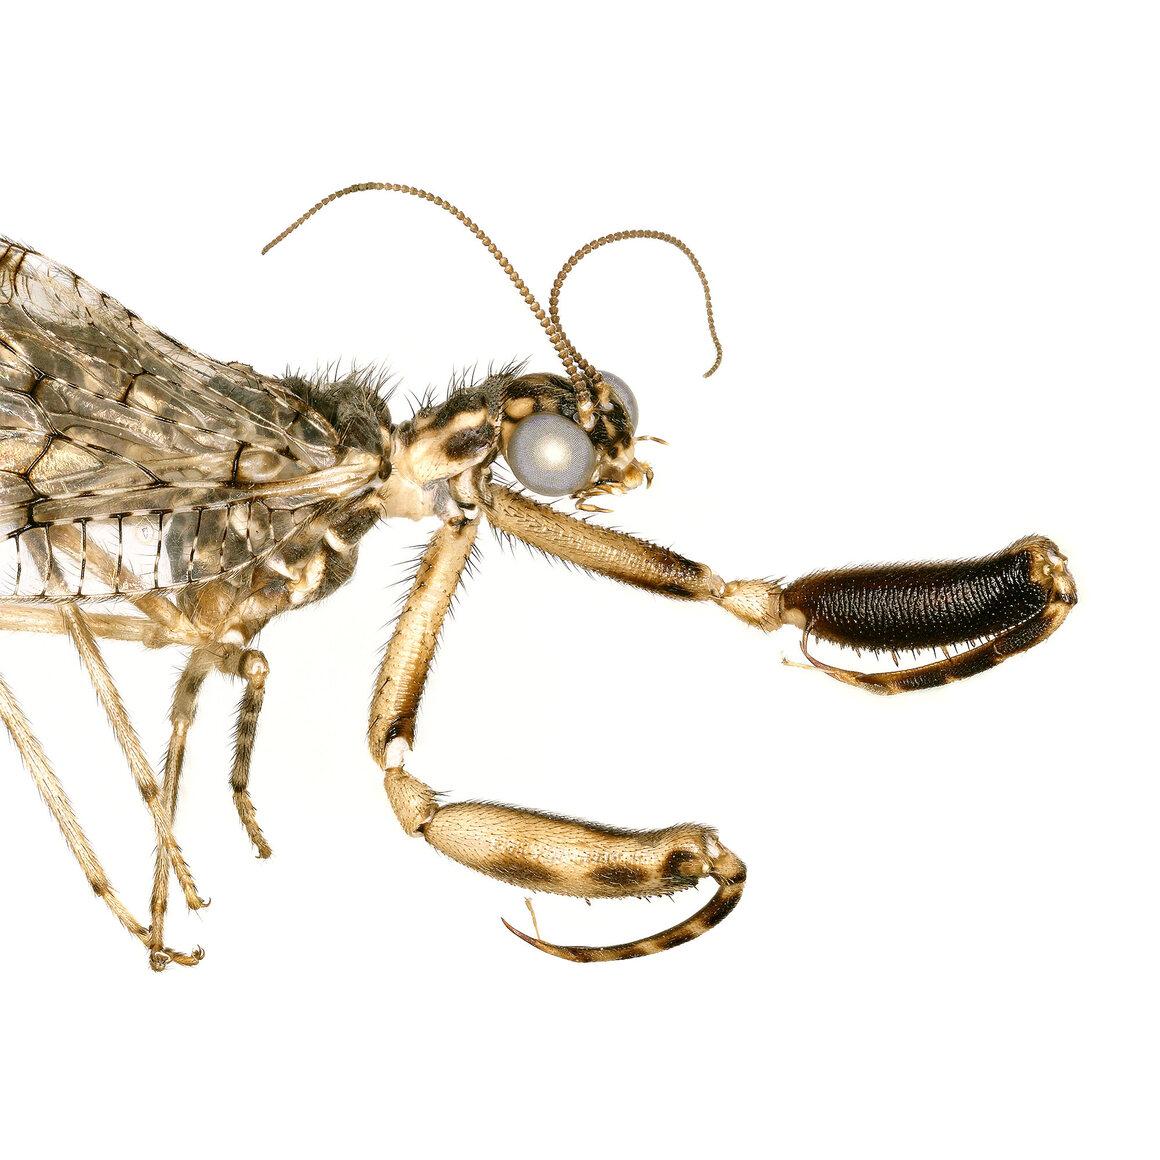 Mantisfly from the genus <em>Plega.